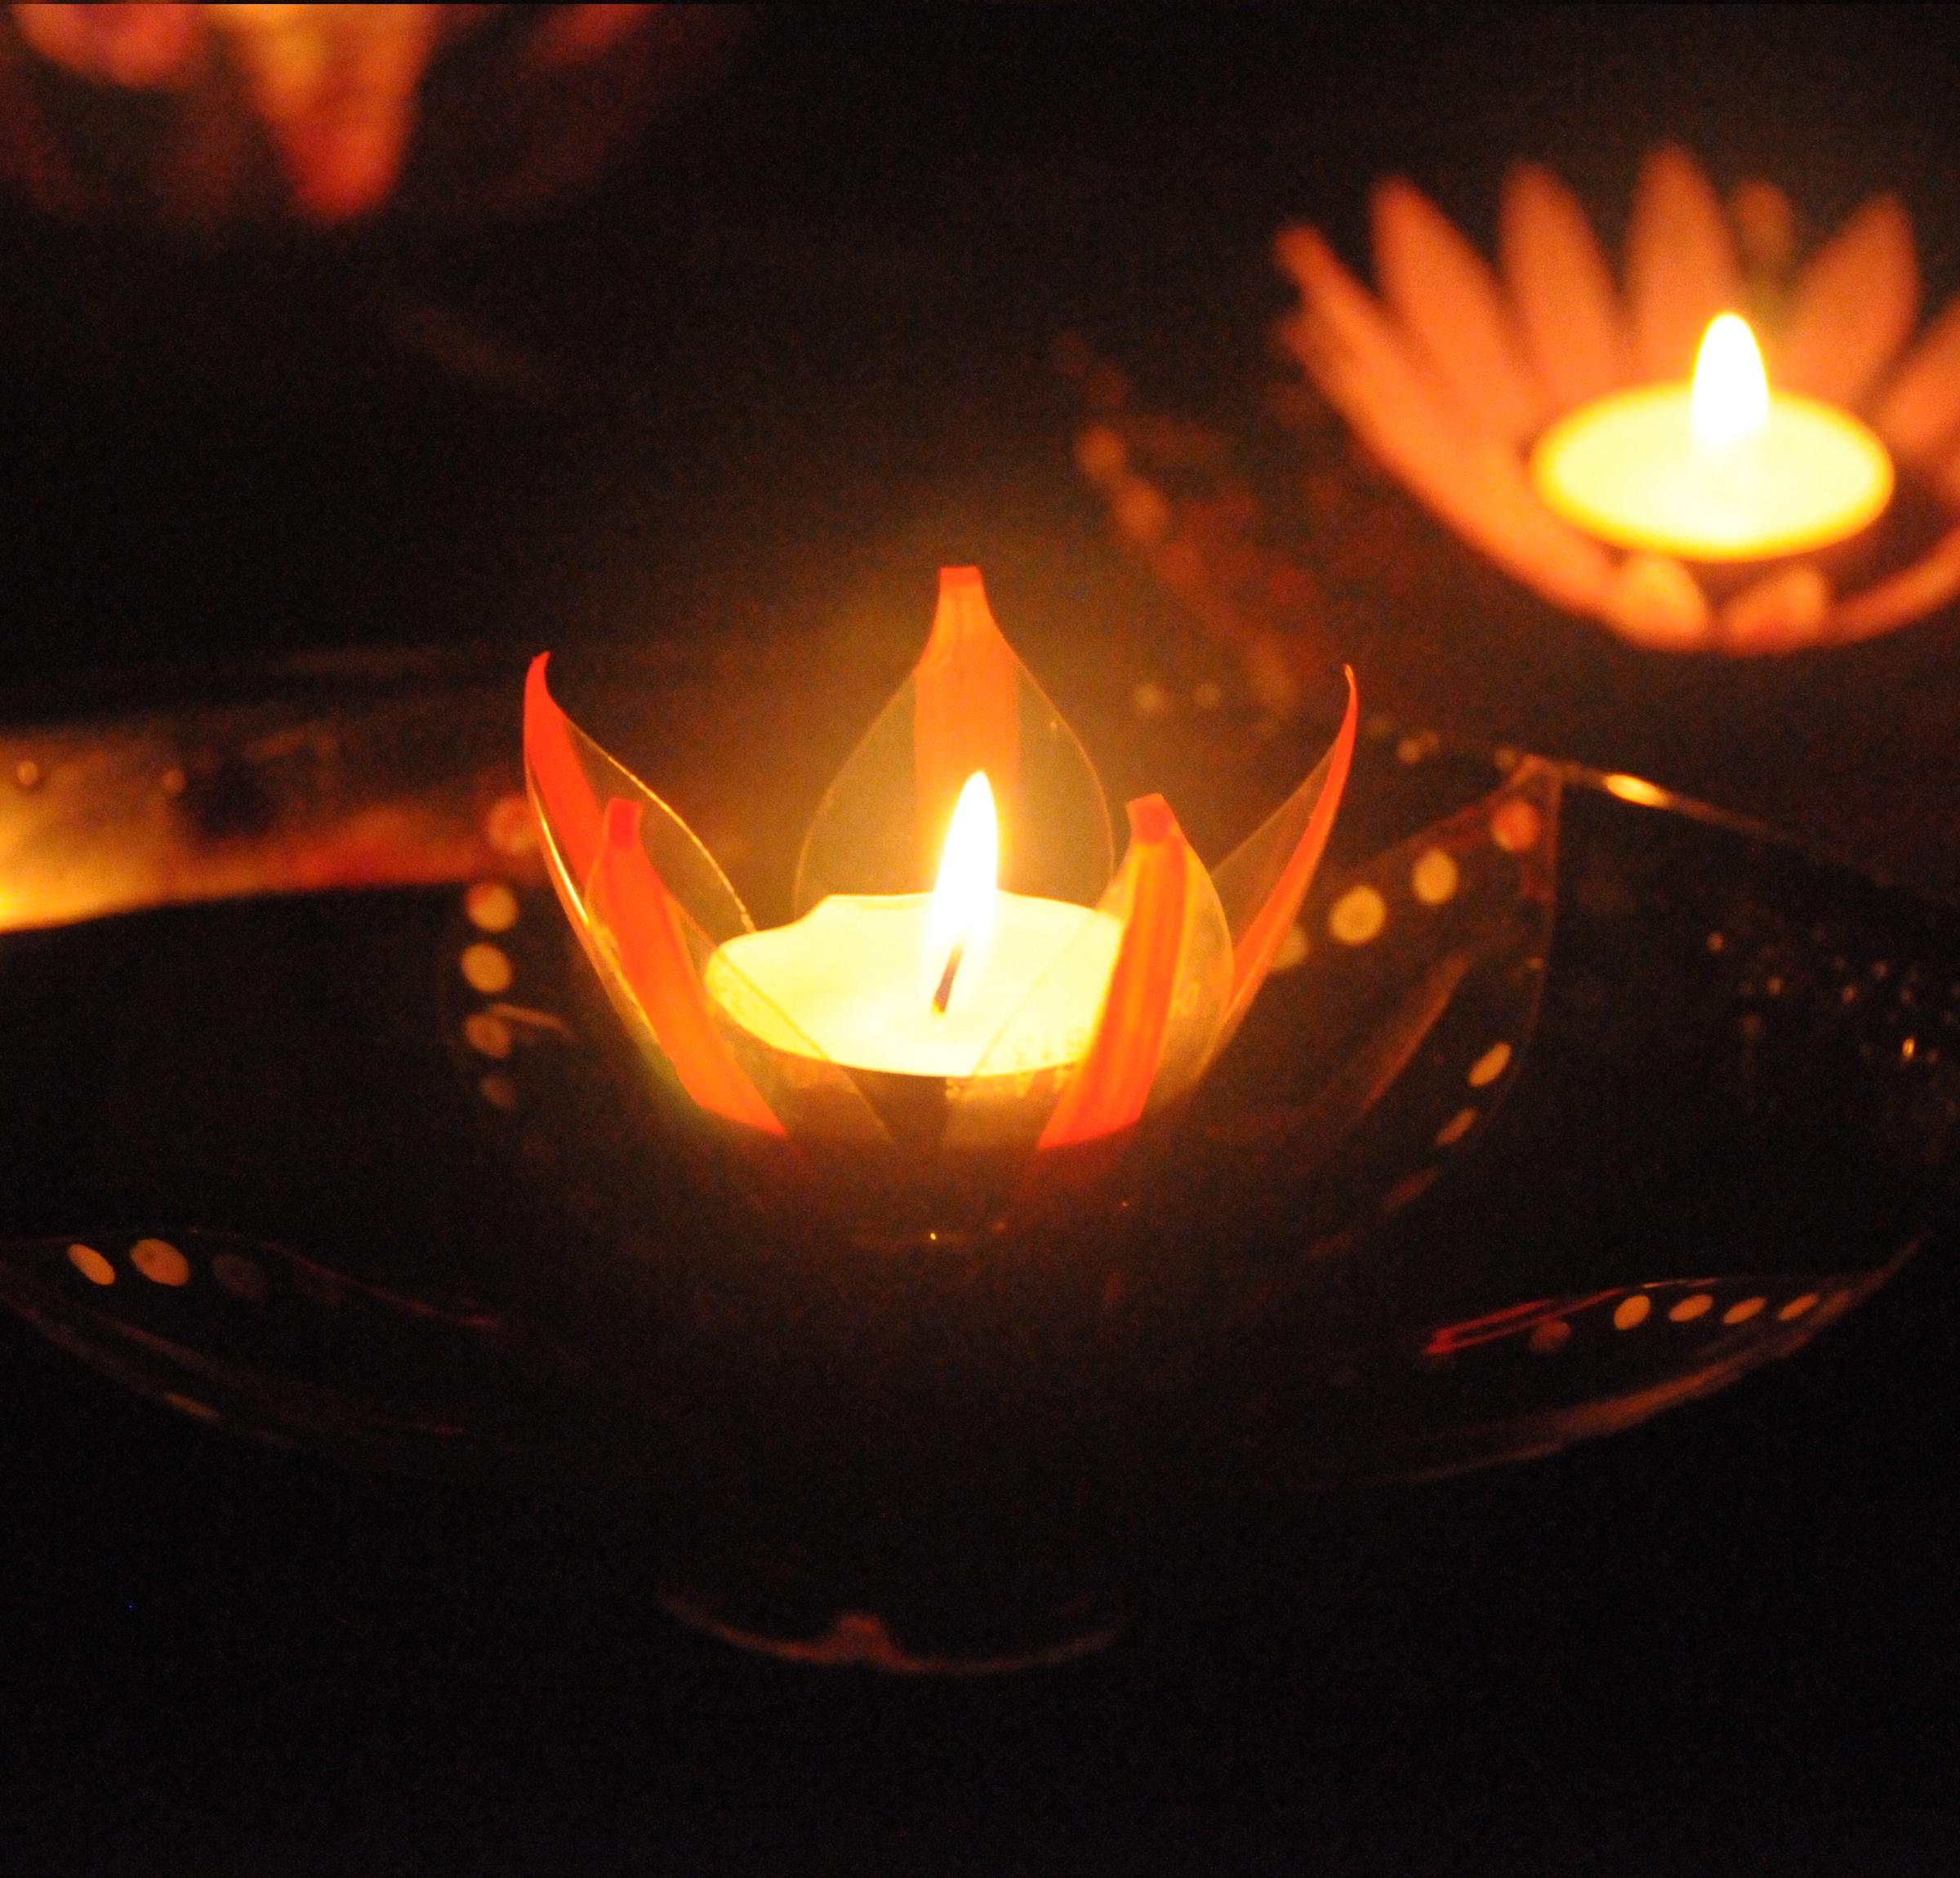 Diwali Flowers - 2014